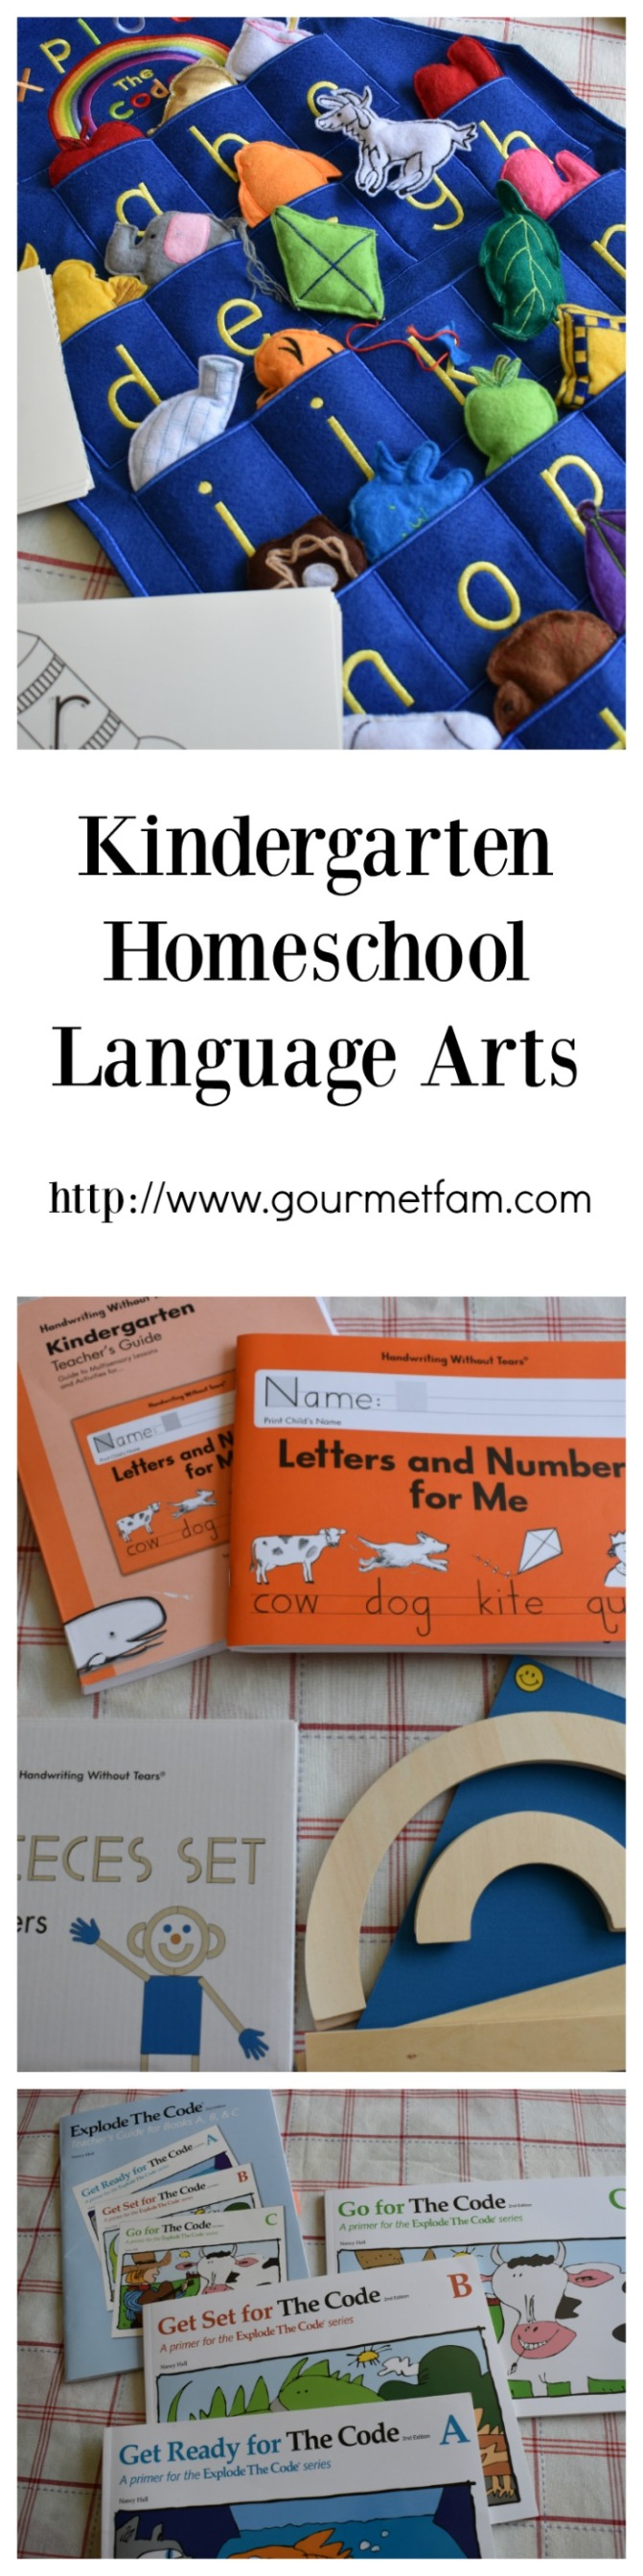 language-arts